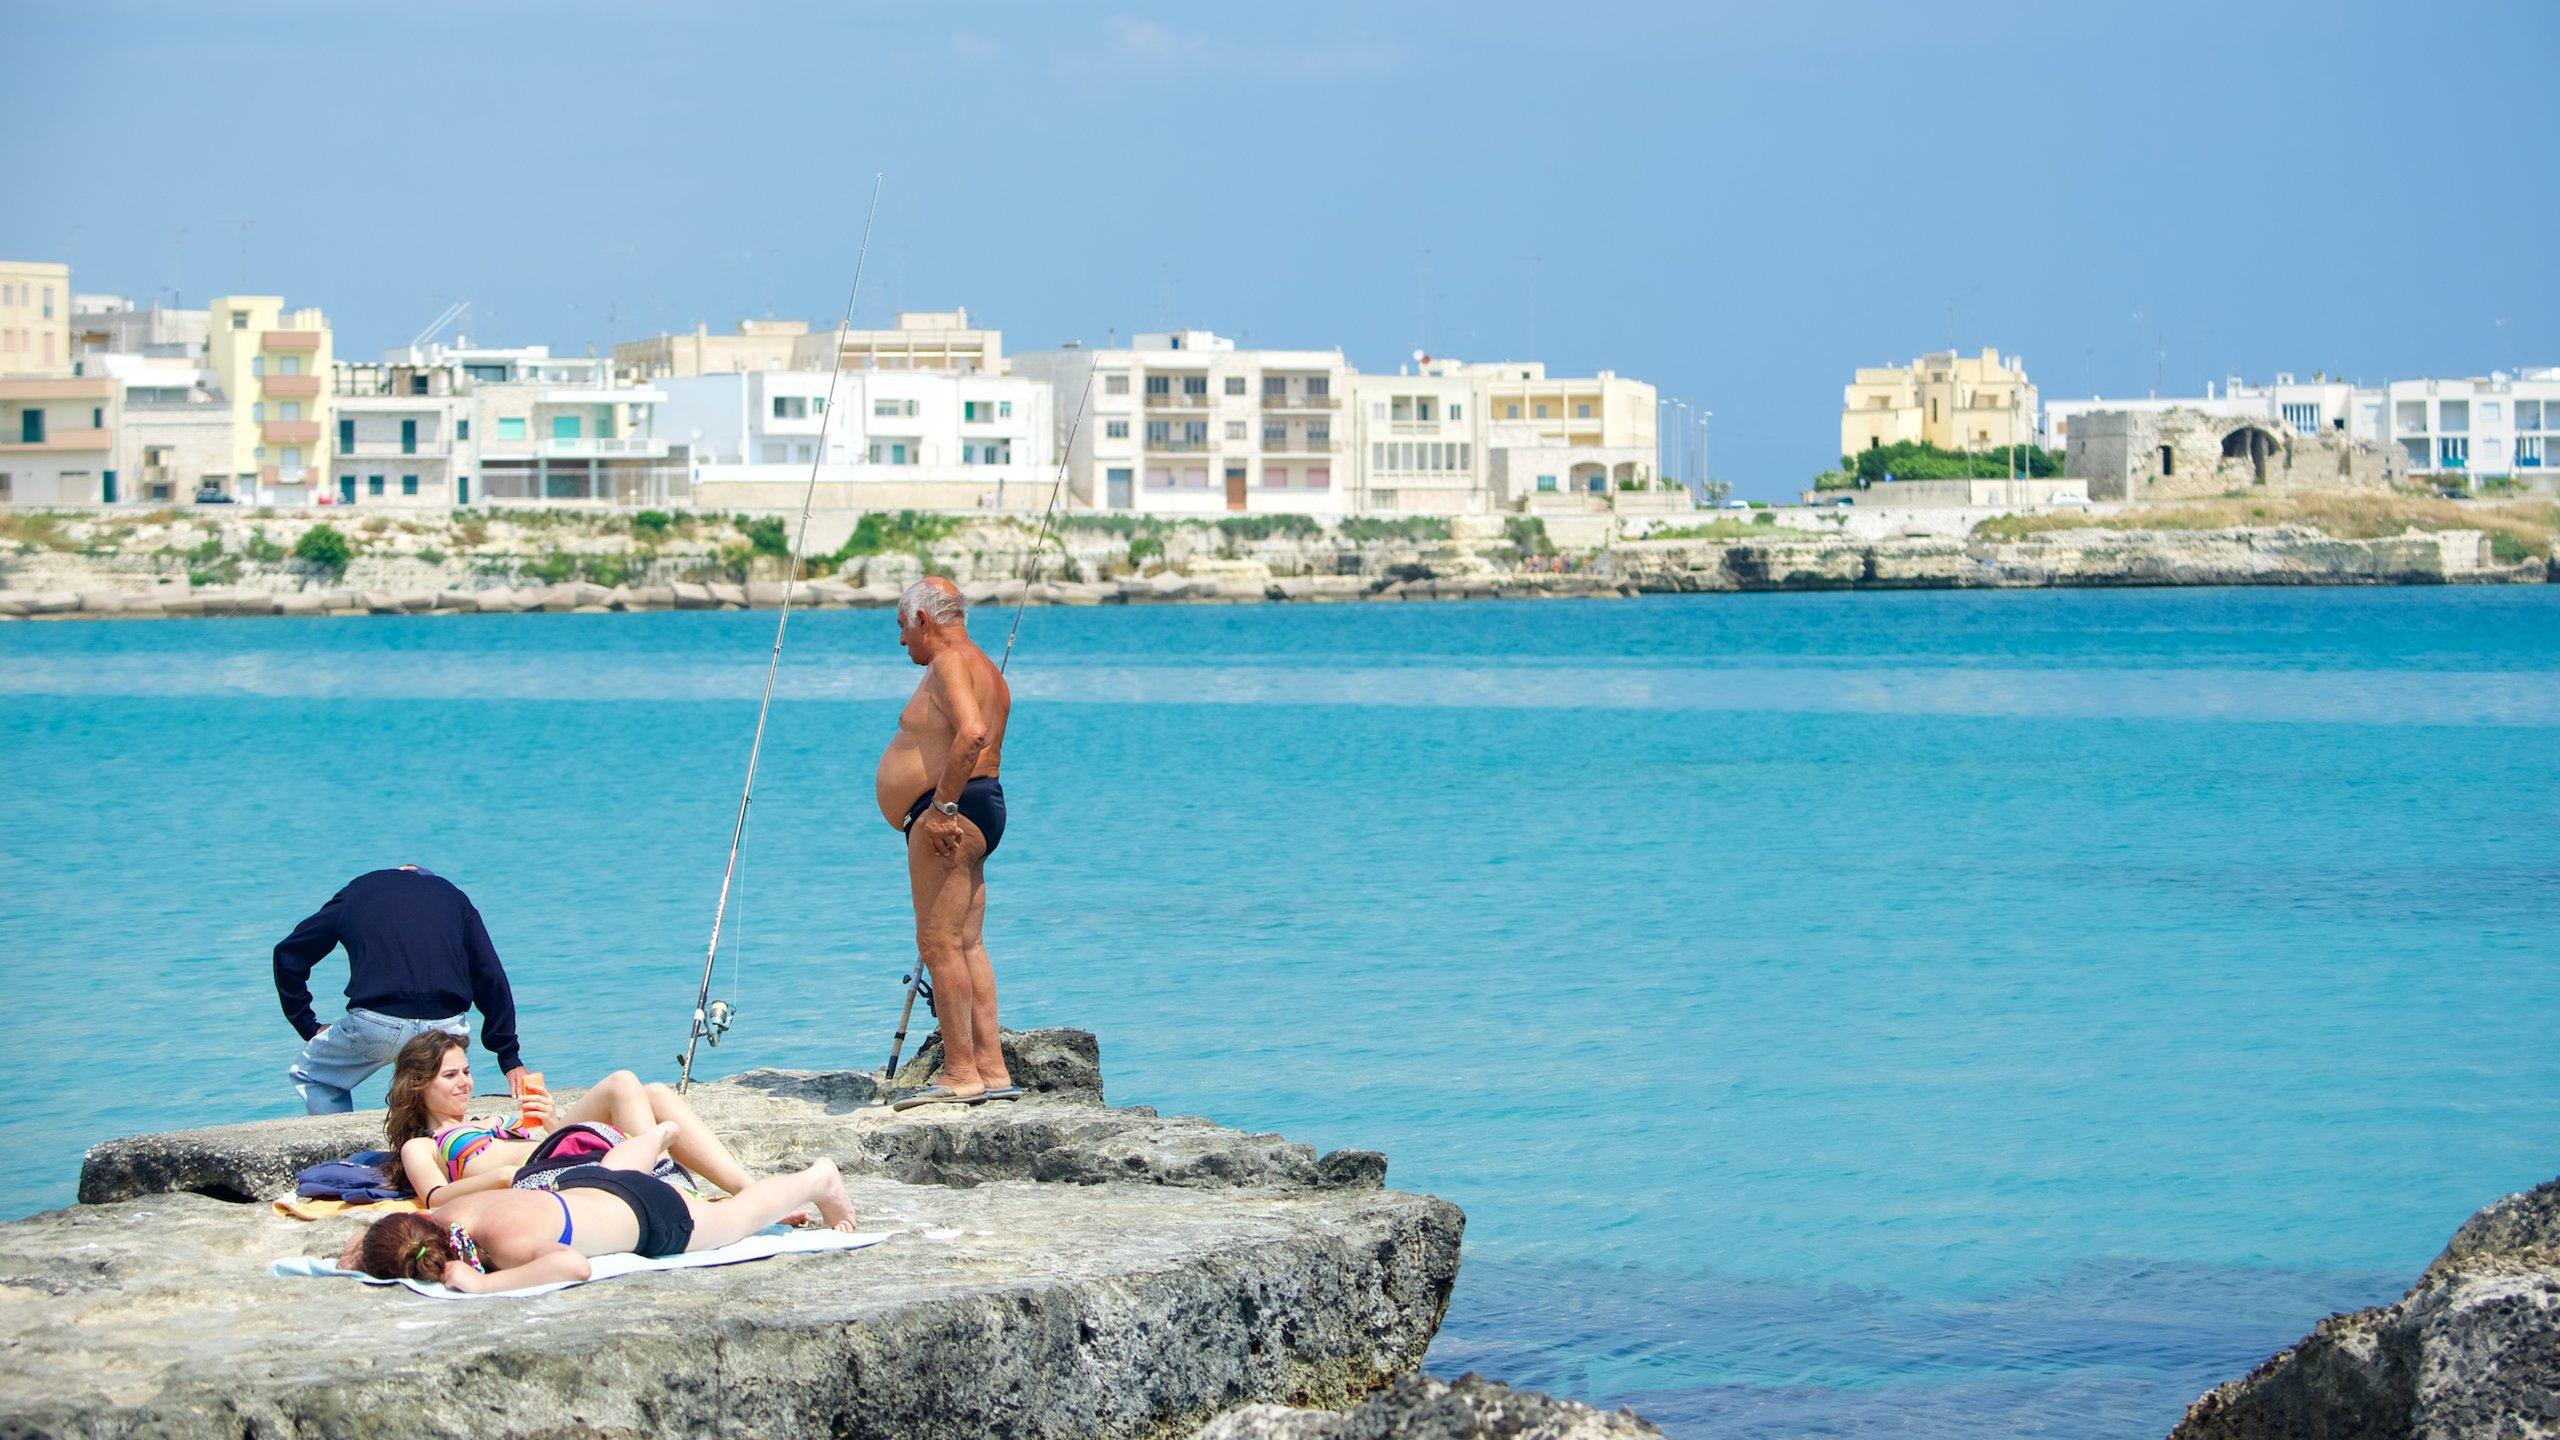 Otranto Waterfront, Otranto, Puglia, Italy